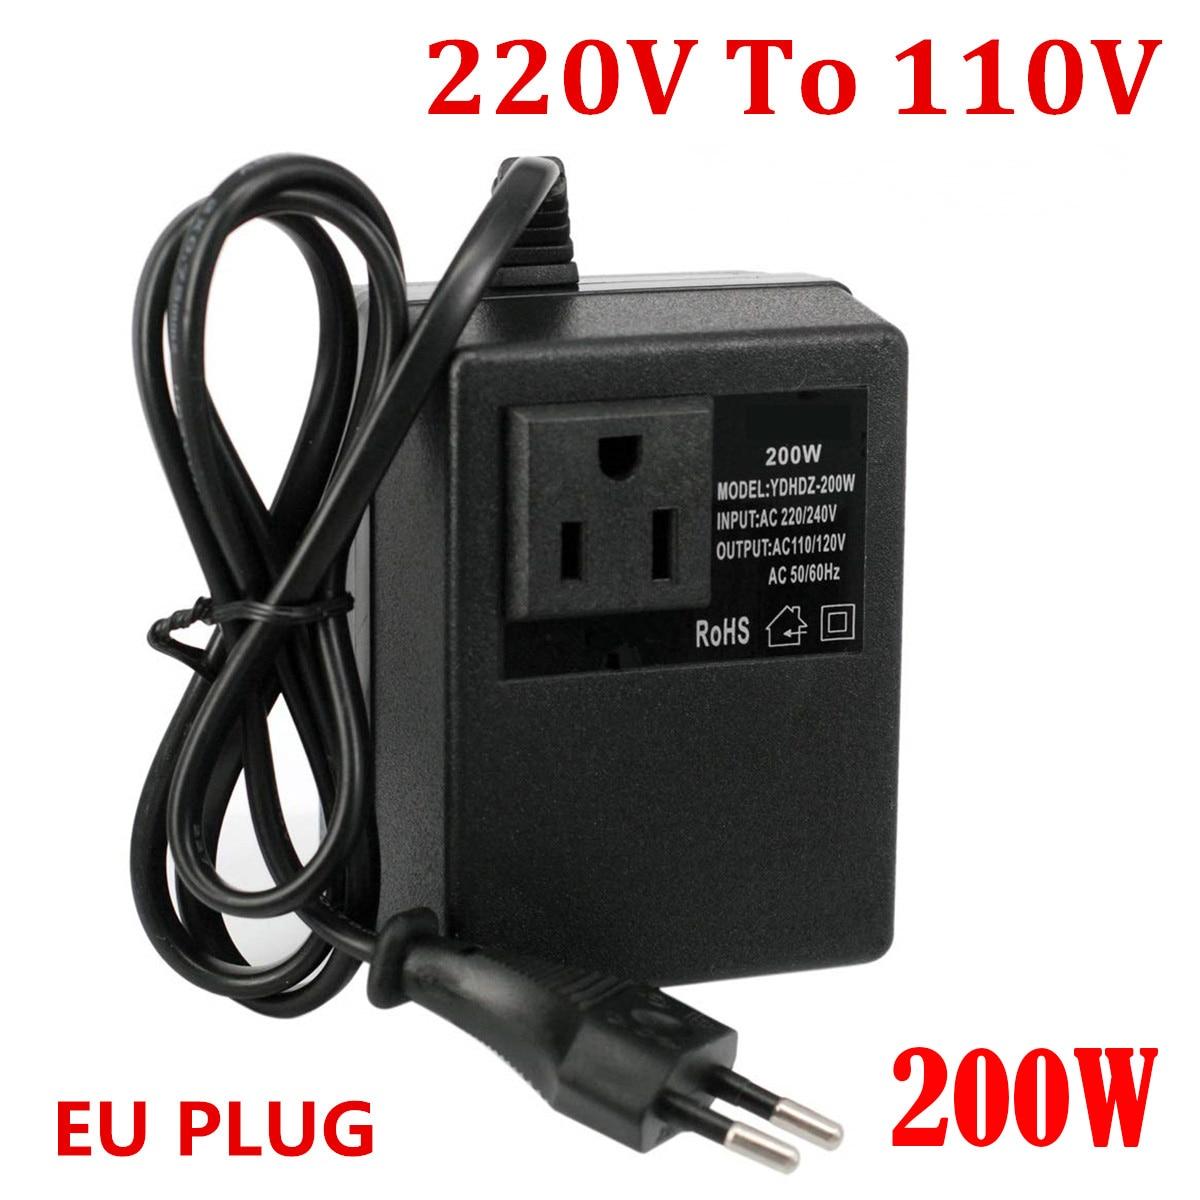 NEW 200W Voltage Converter Transformer 220V To 110V Step Down Travel EU Plug Voltage Transformer Converter